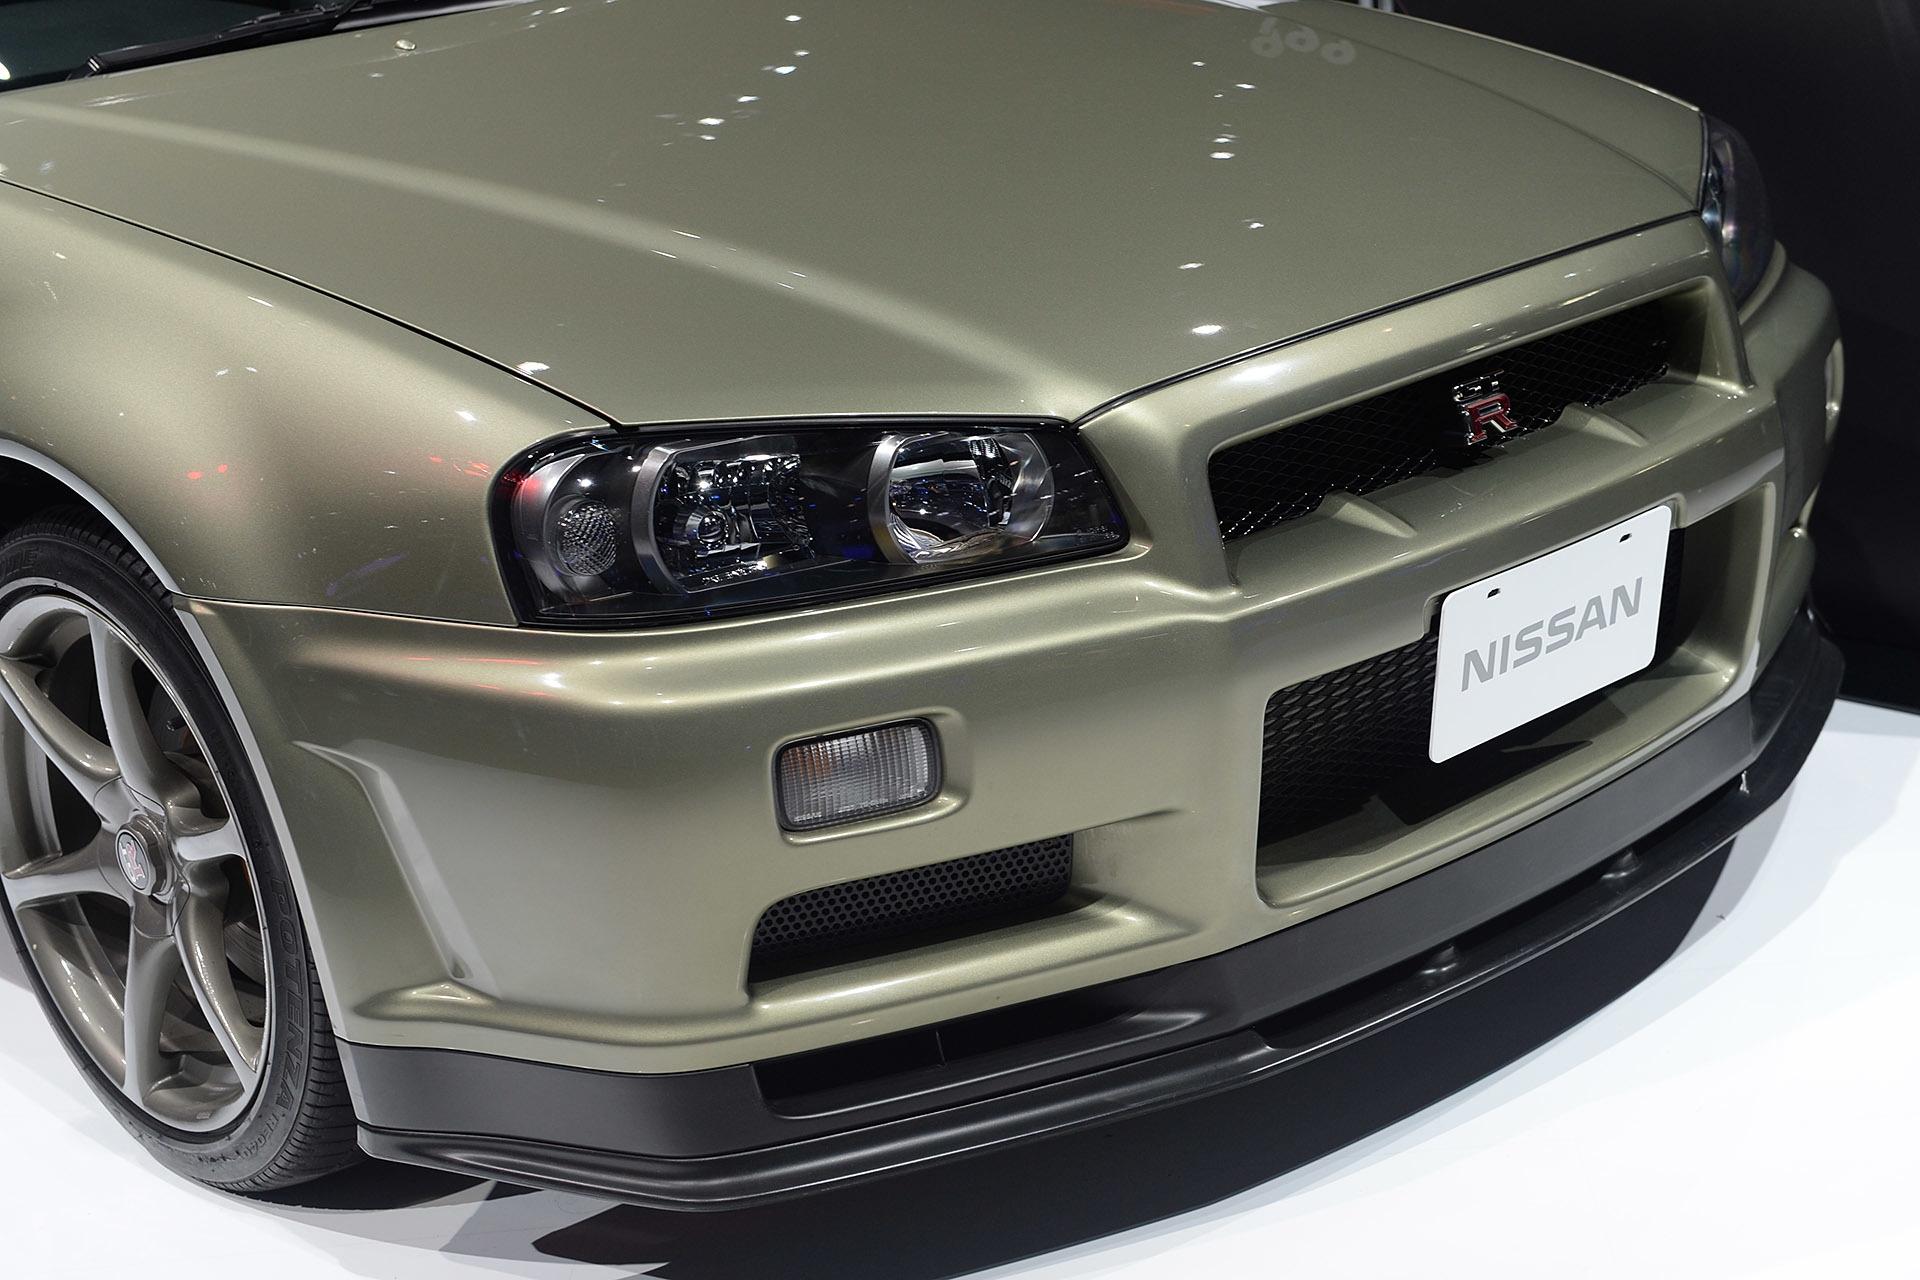 Фото автомобилей Nissan Skyline всех годов выпуска: https://car4play.ru/lifestyle/pokoleniya-nissan-skyline-predstavlyayushchie-2017-gtr